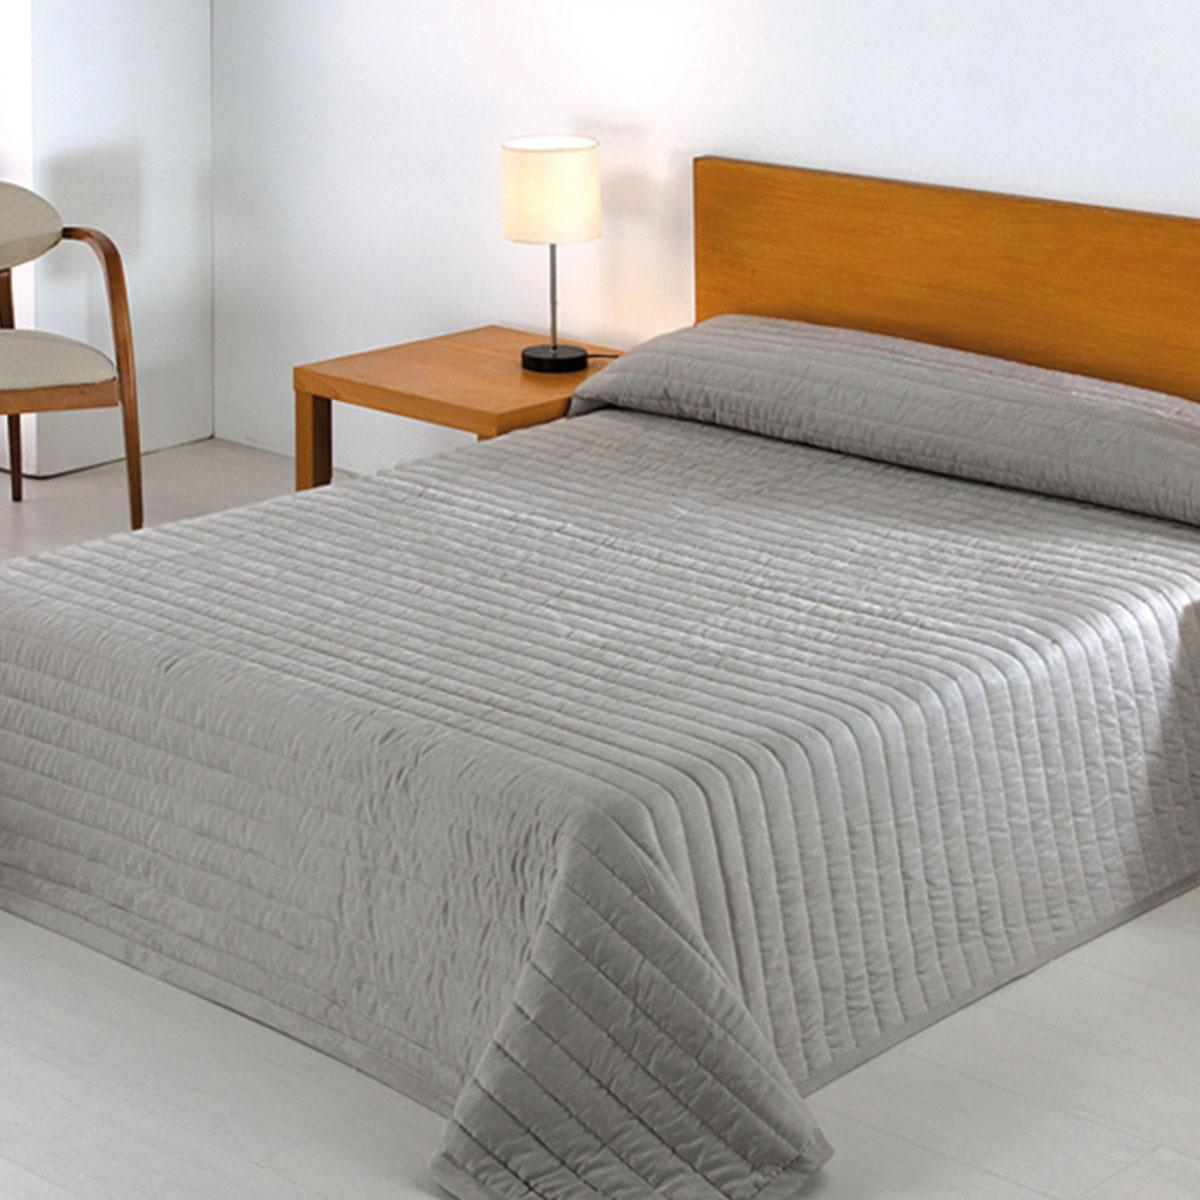 jet de lit tildou matelass standard textile